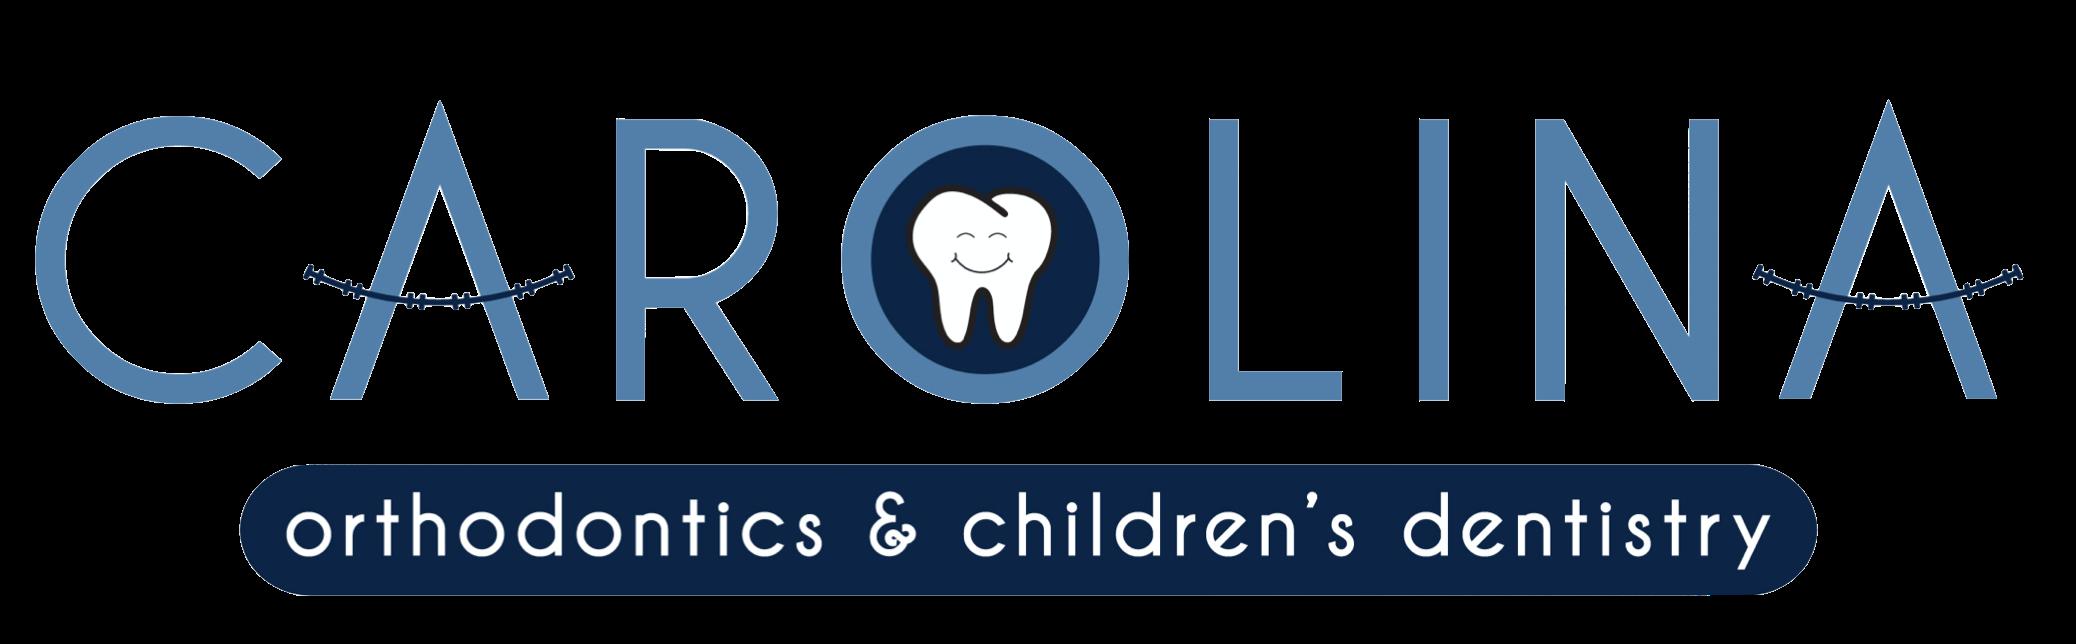 Carolina Orthodontics & Children's Dentistry